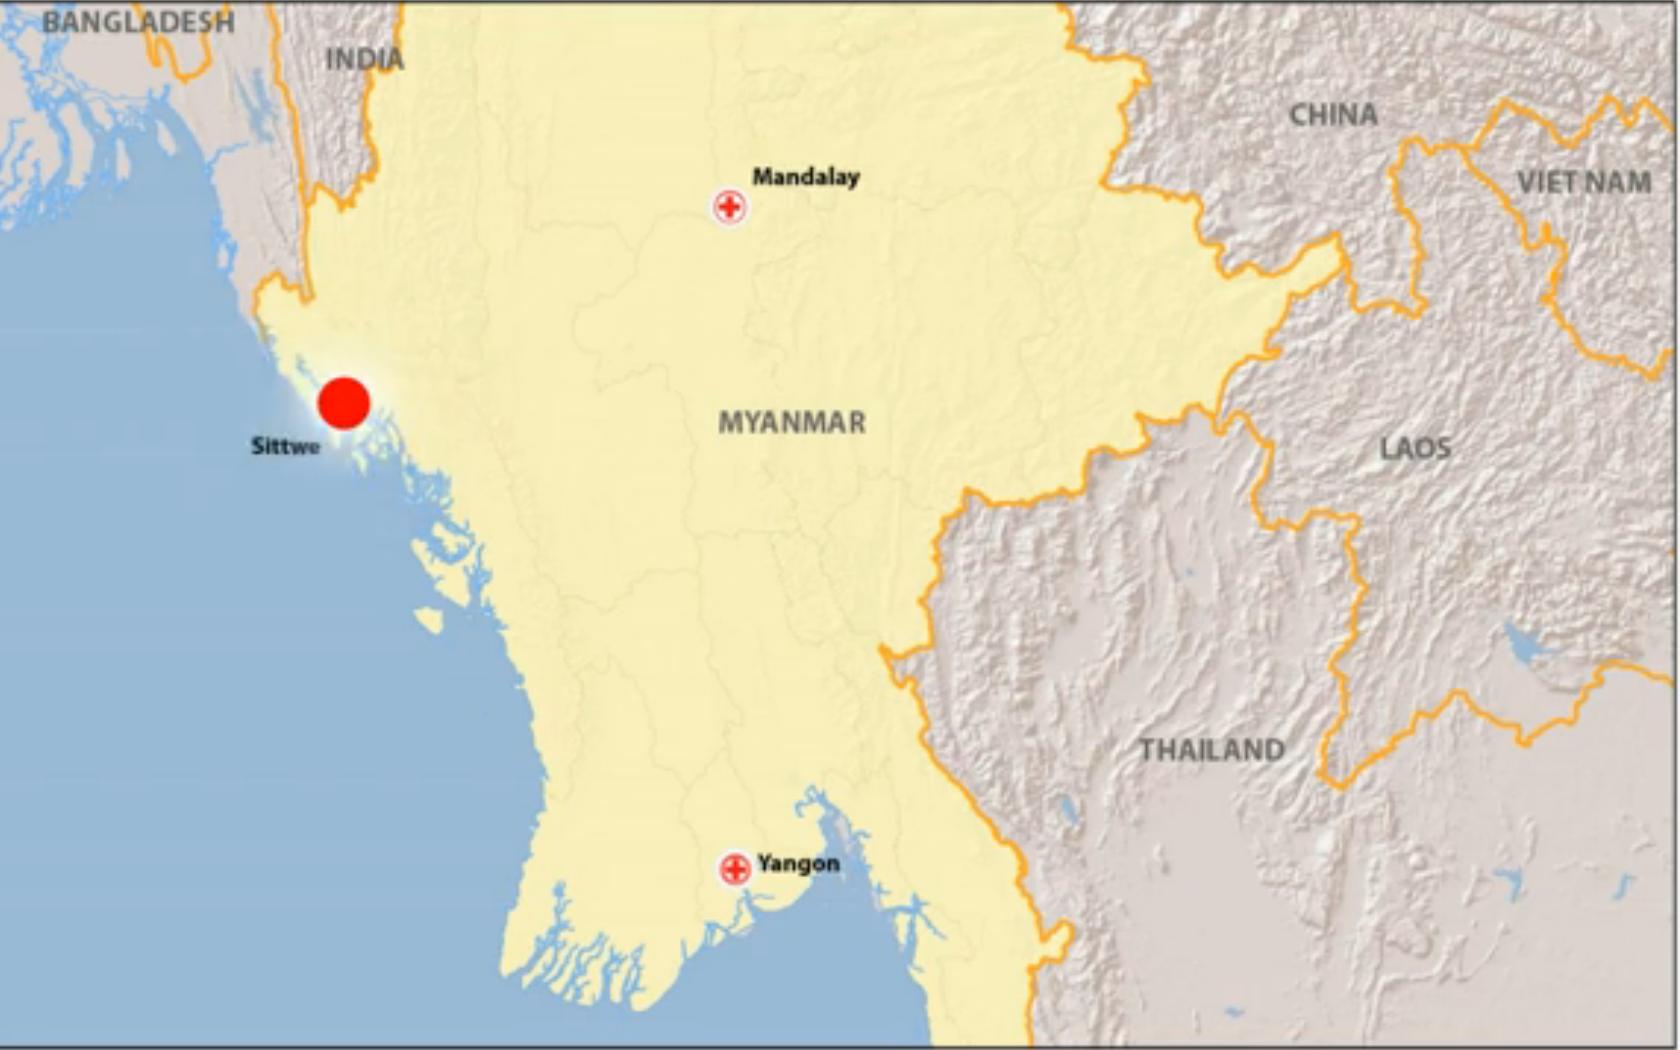 In Myanmar, responding to pressing needs in Rakhine State